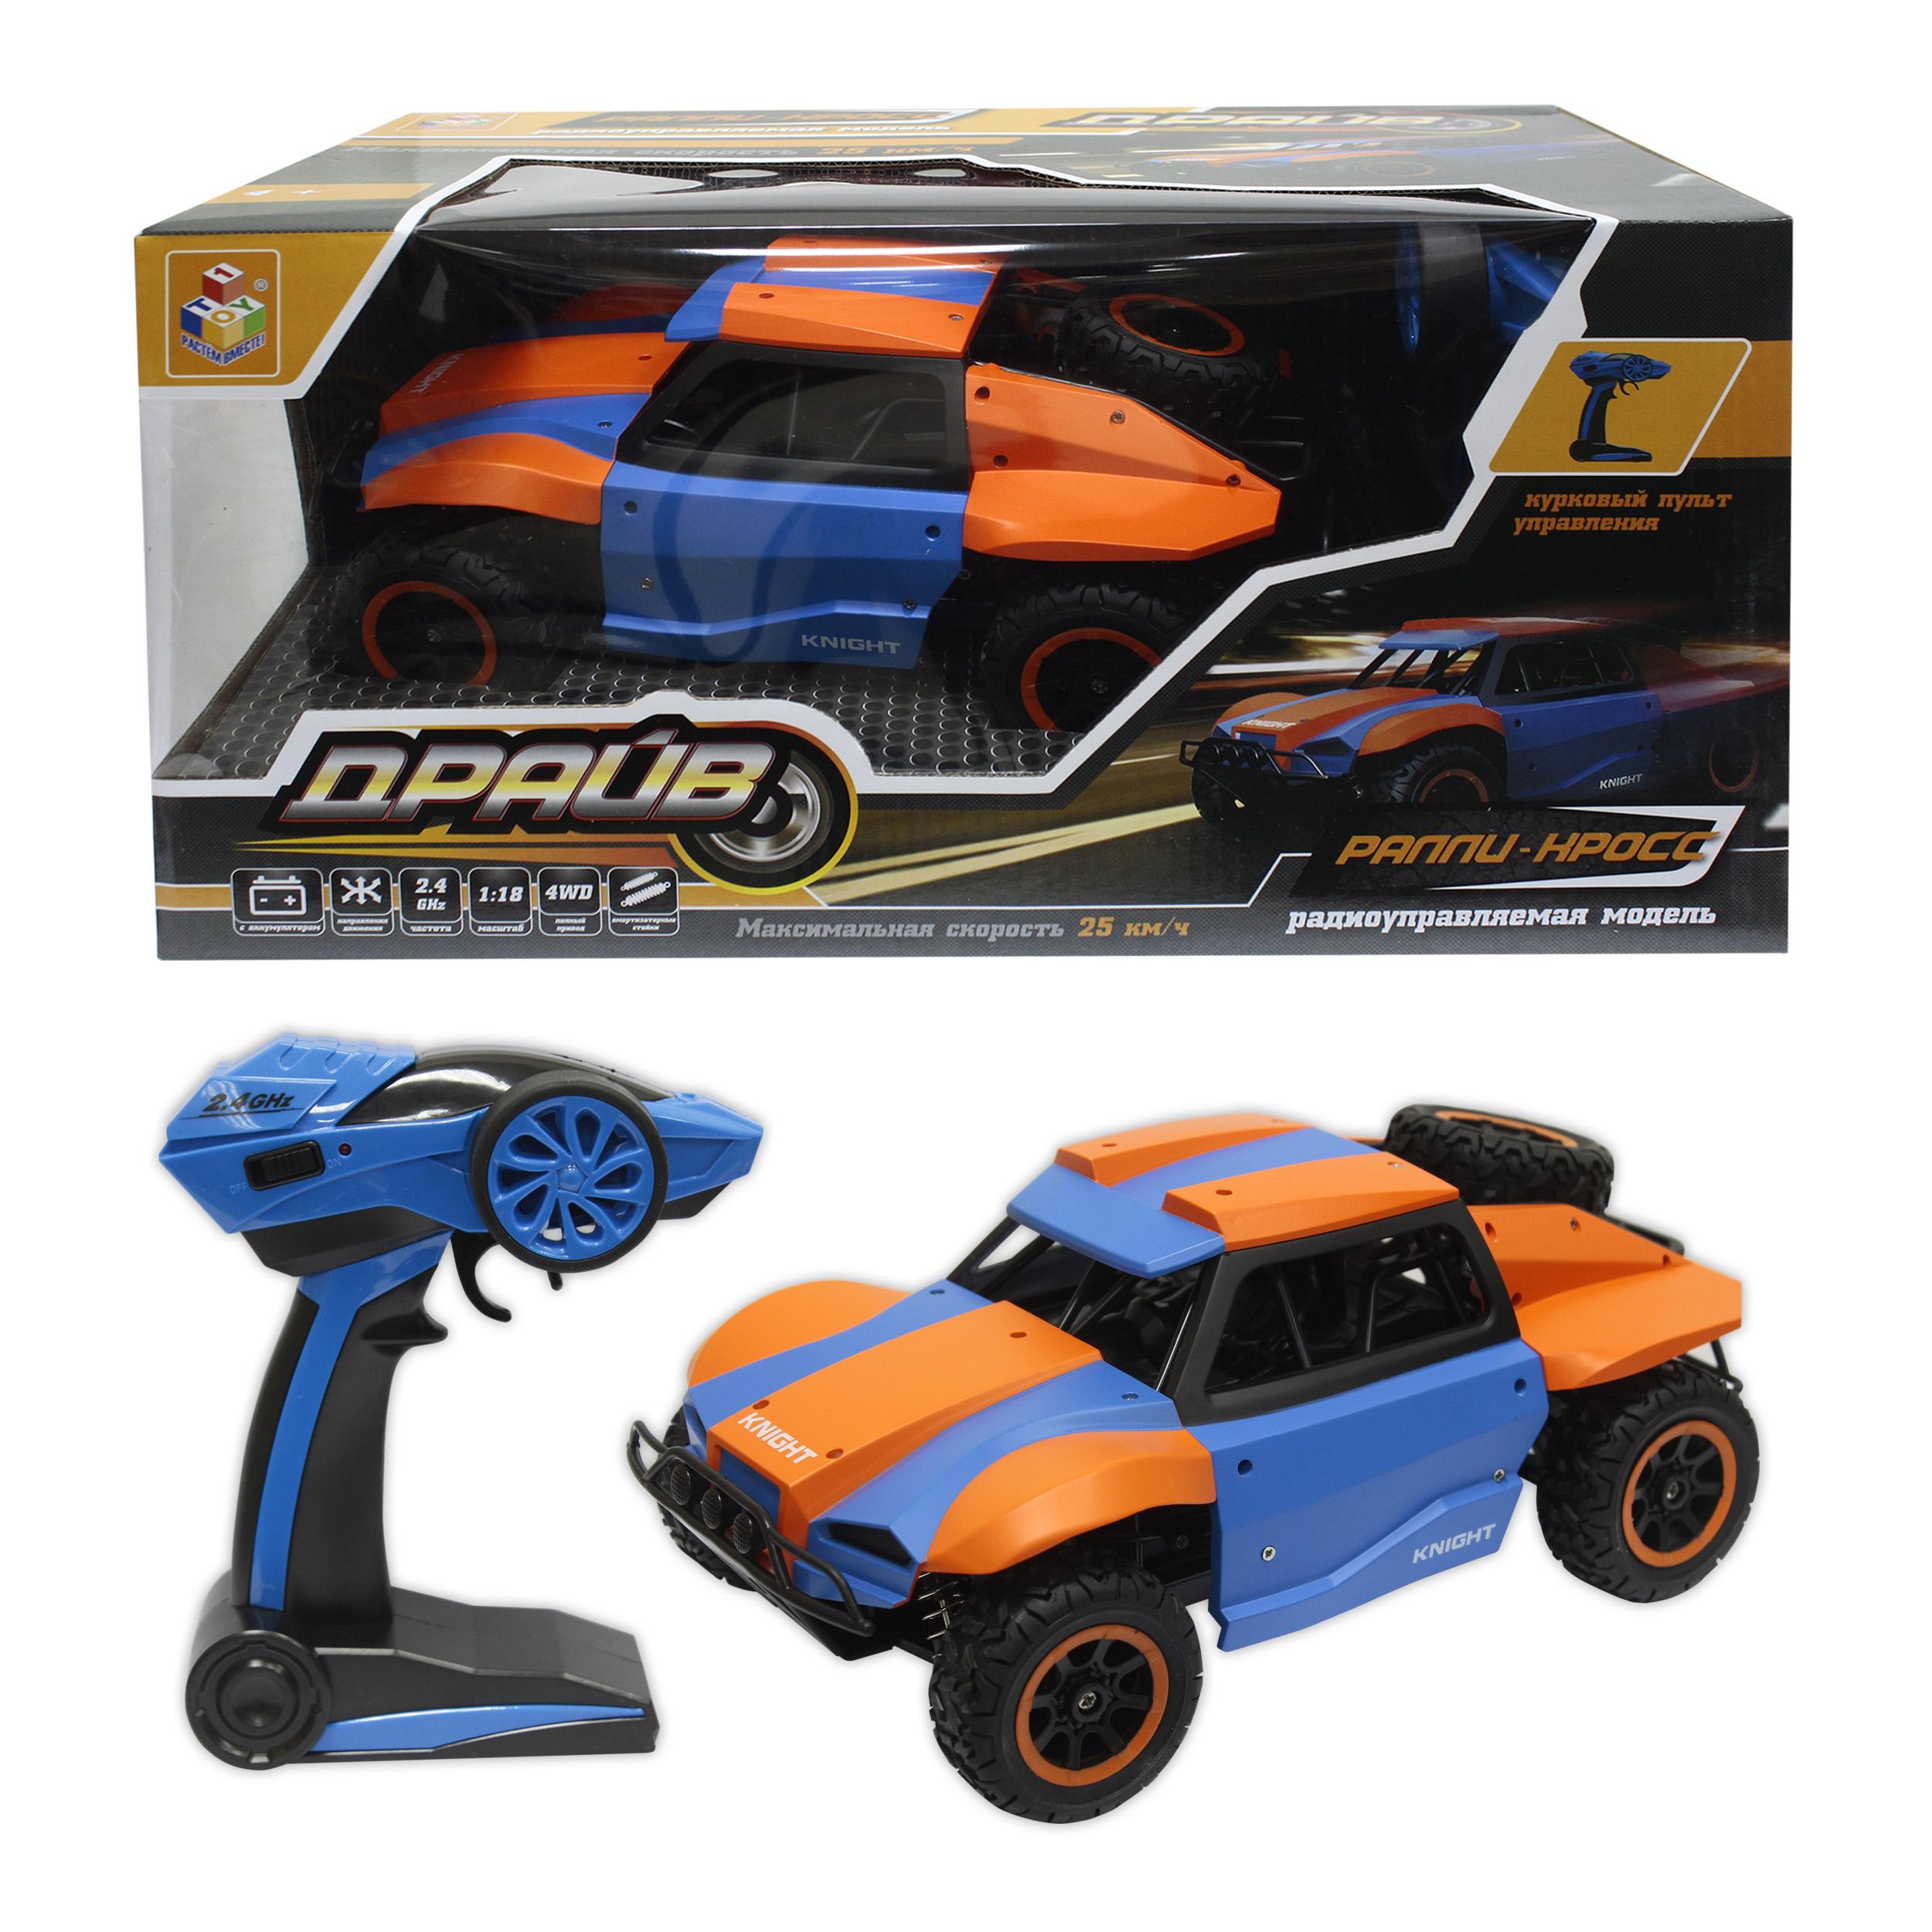 1toy Драйв, раллийная машина на р/у, 2,4GHz, 4WD, масштаб 1:18, скорость до 25км/ч, курковый пульт, 8887856109697 1toy раллийная машина на р у